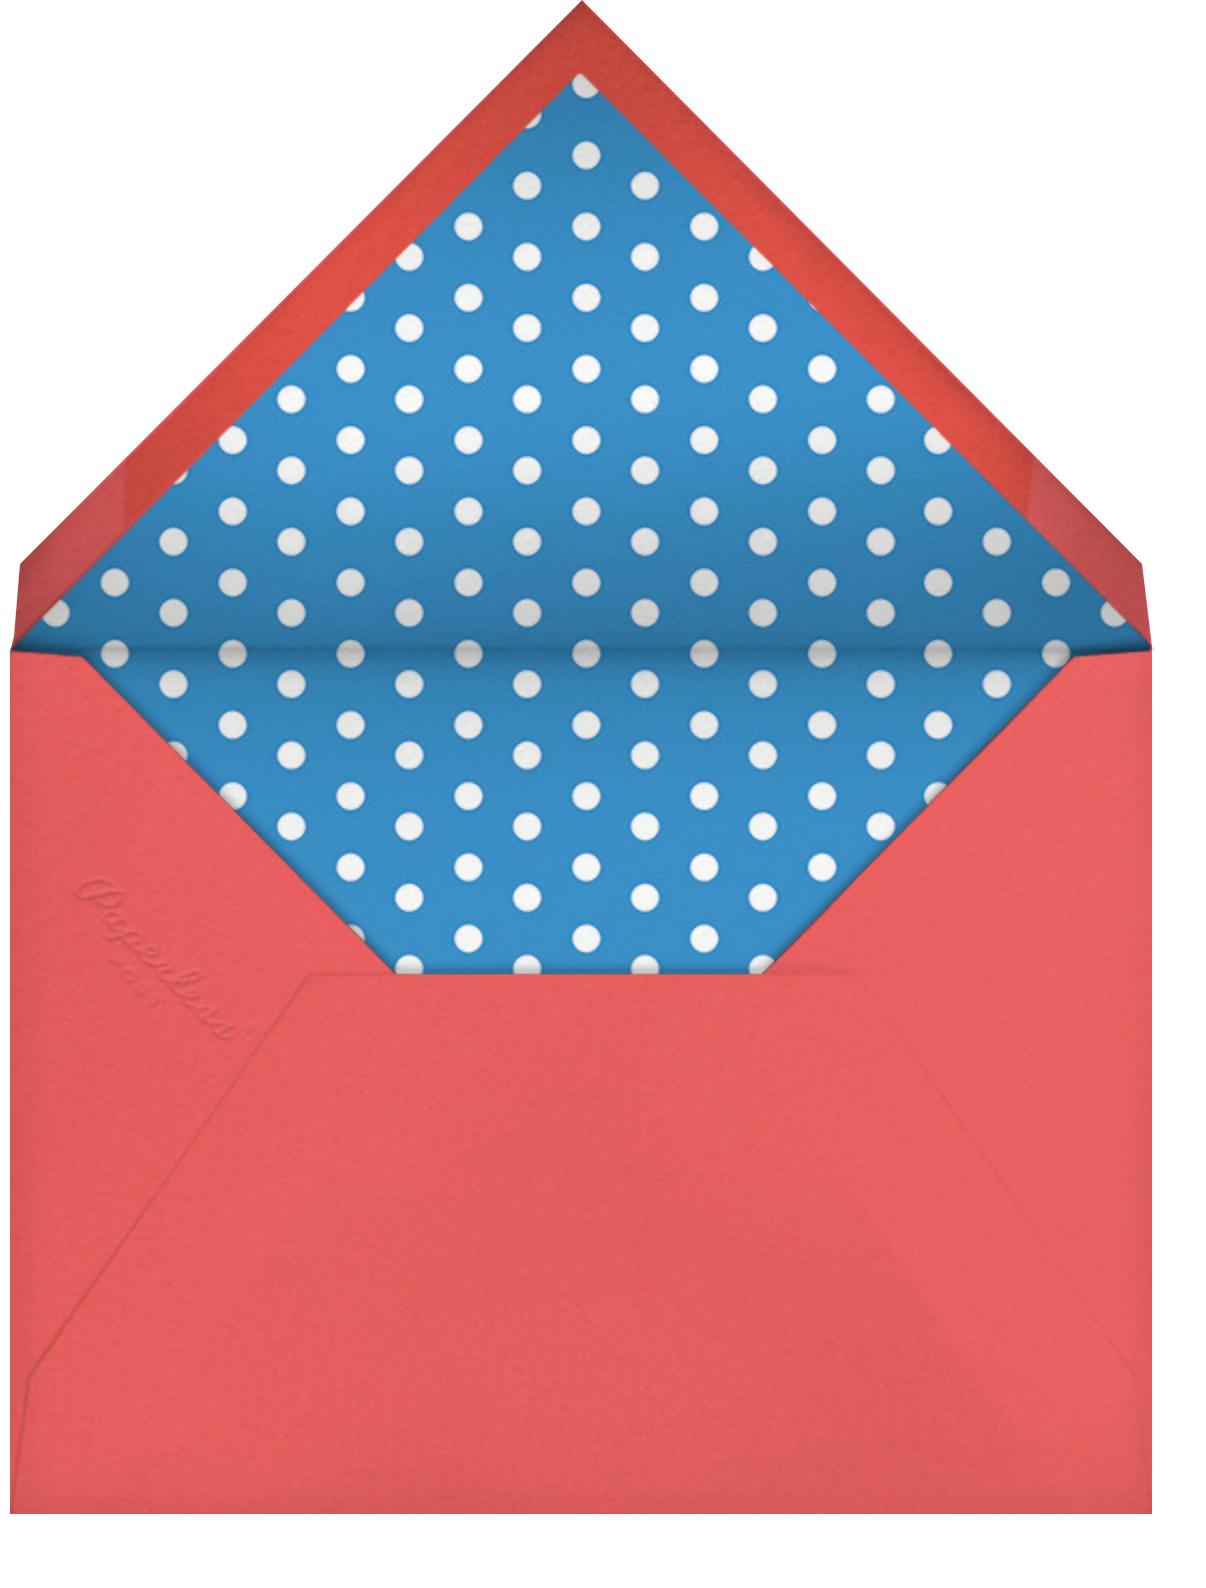 Poncho - Paperless Post - Cinco de Mayo - envelope back